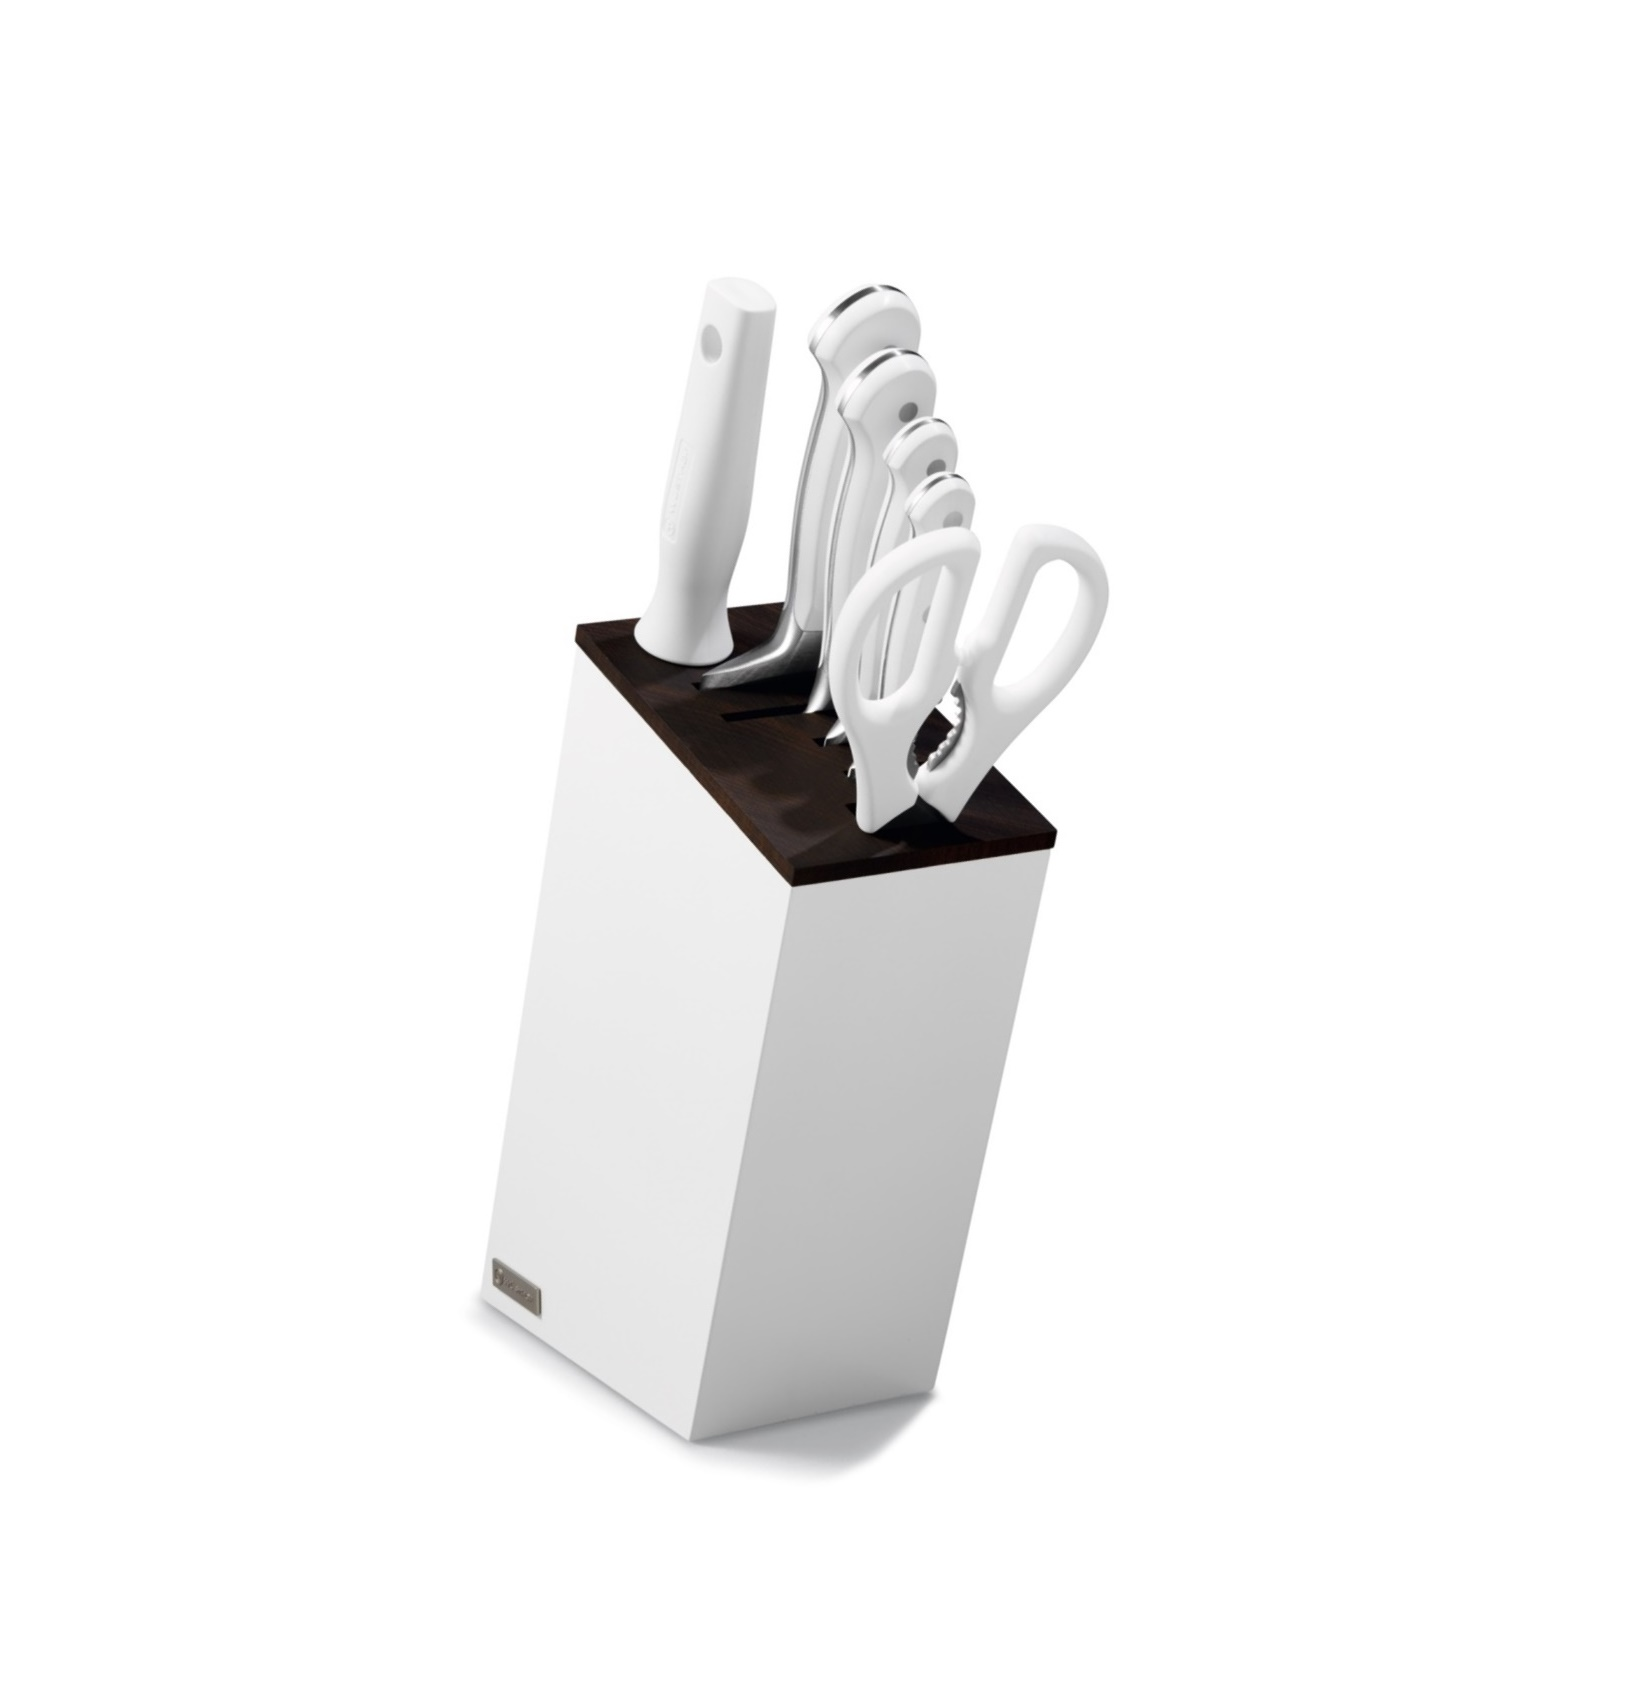 Blok s noži CLASSIC White 6 ks - verze Santoku - Wüsthof Dreizack Solingen